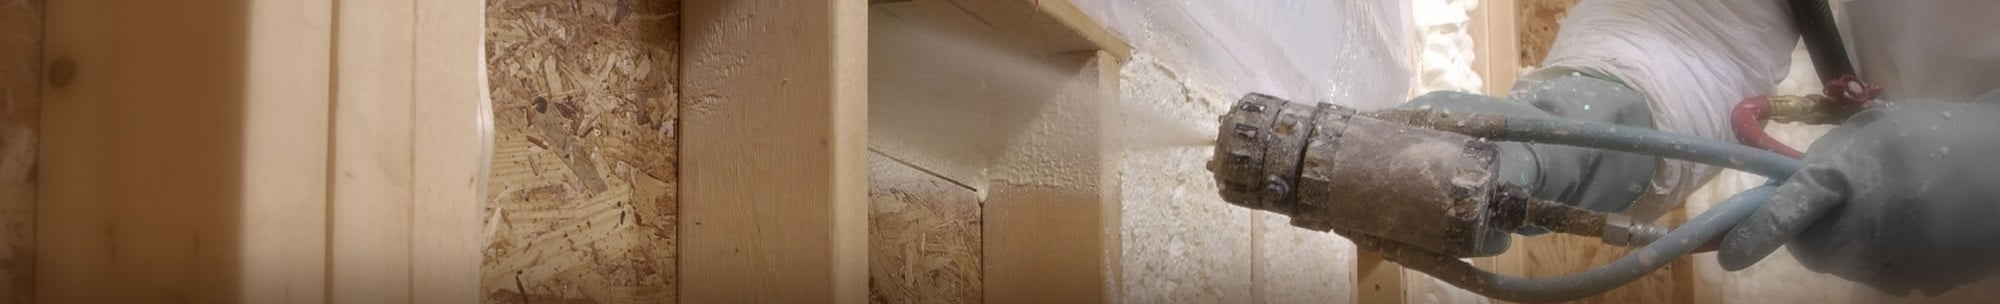 Spray foam Insulation installers sacramento